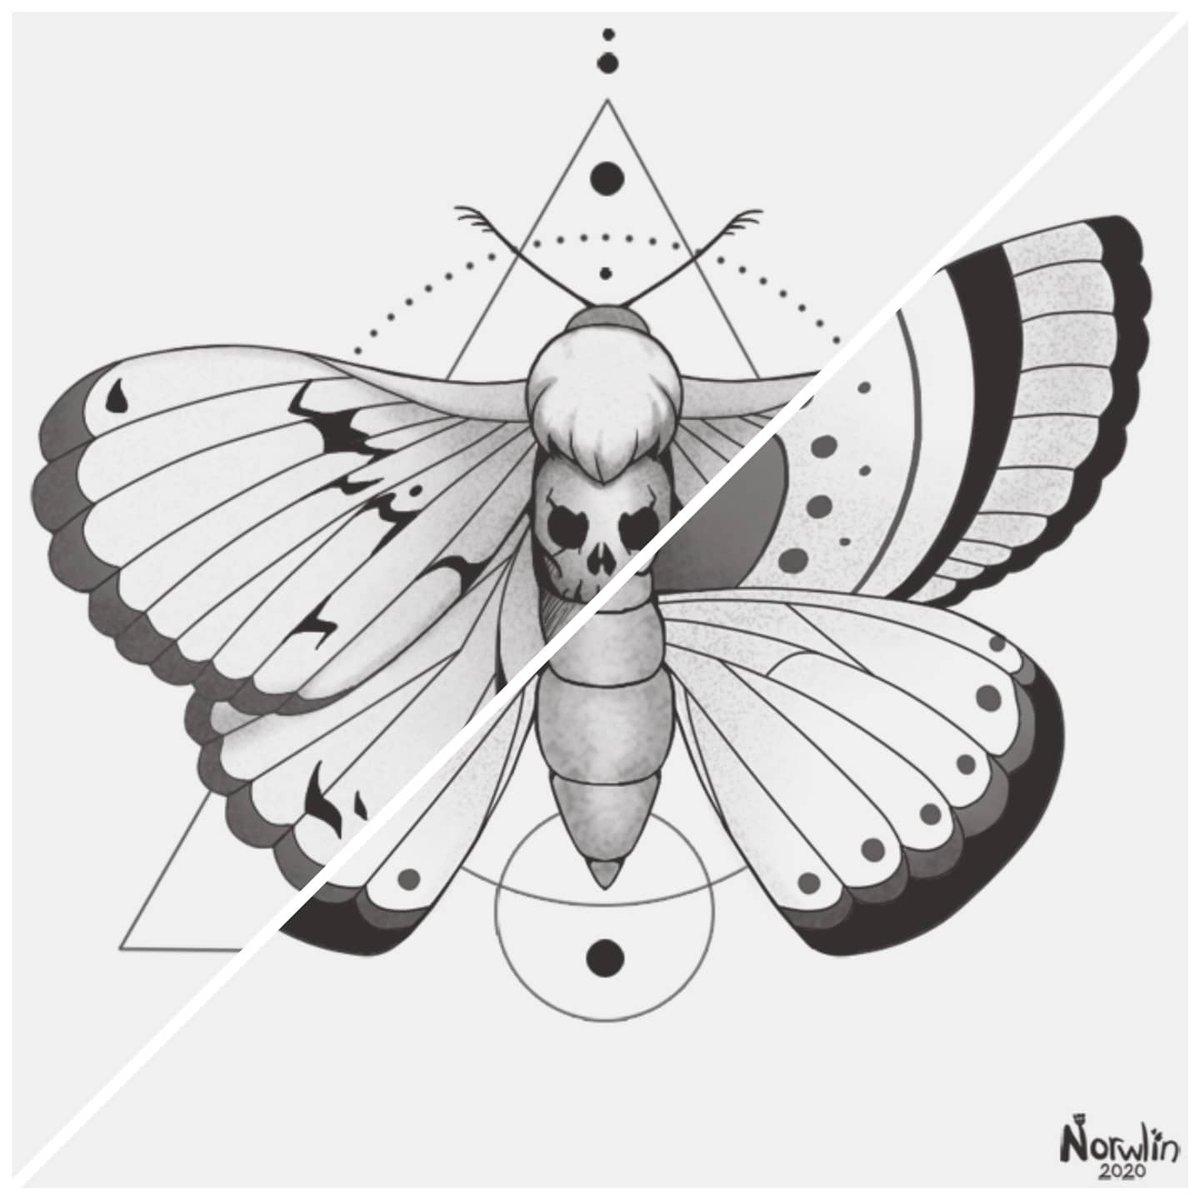 Möfs #digitalart #art #drawing #bugs #moth #mothtattoo #blackandwhiteart #blackandwhitedrawing #tattoodesign #bugpic.twitter.com/ViX72svMGa